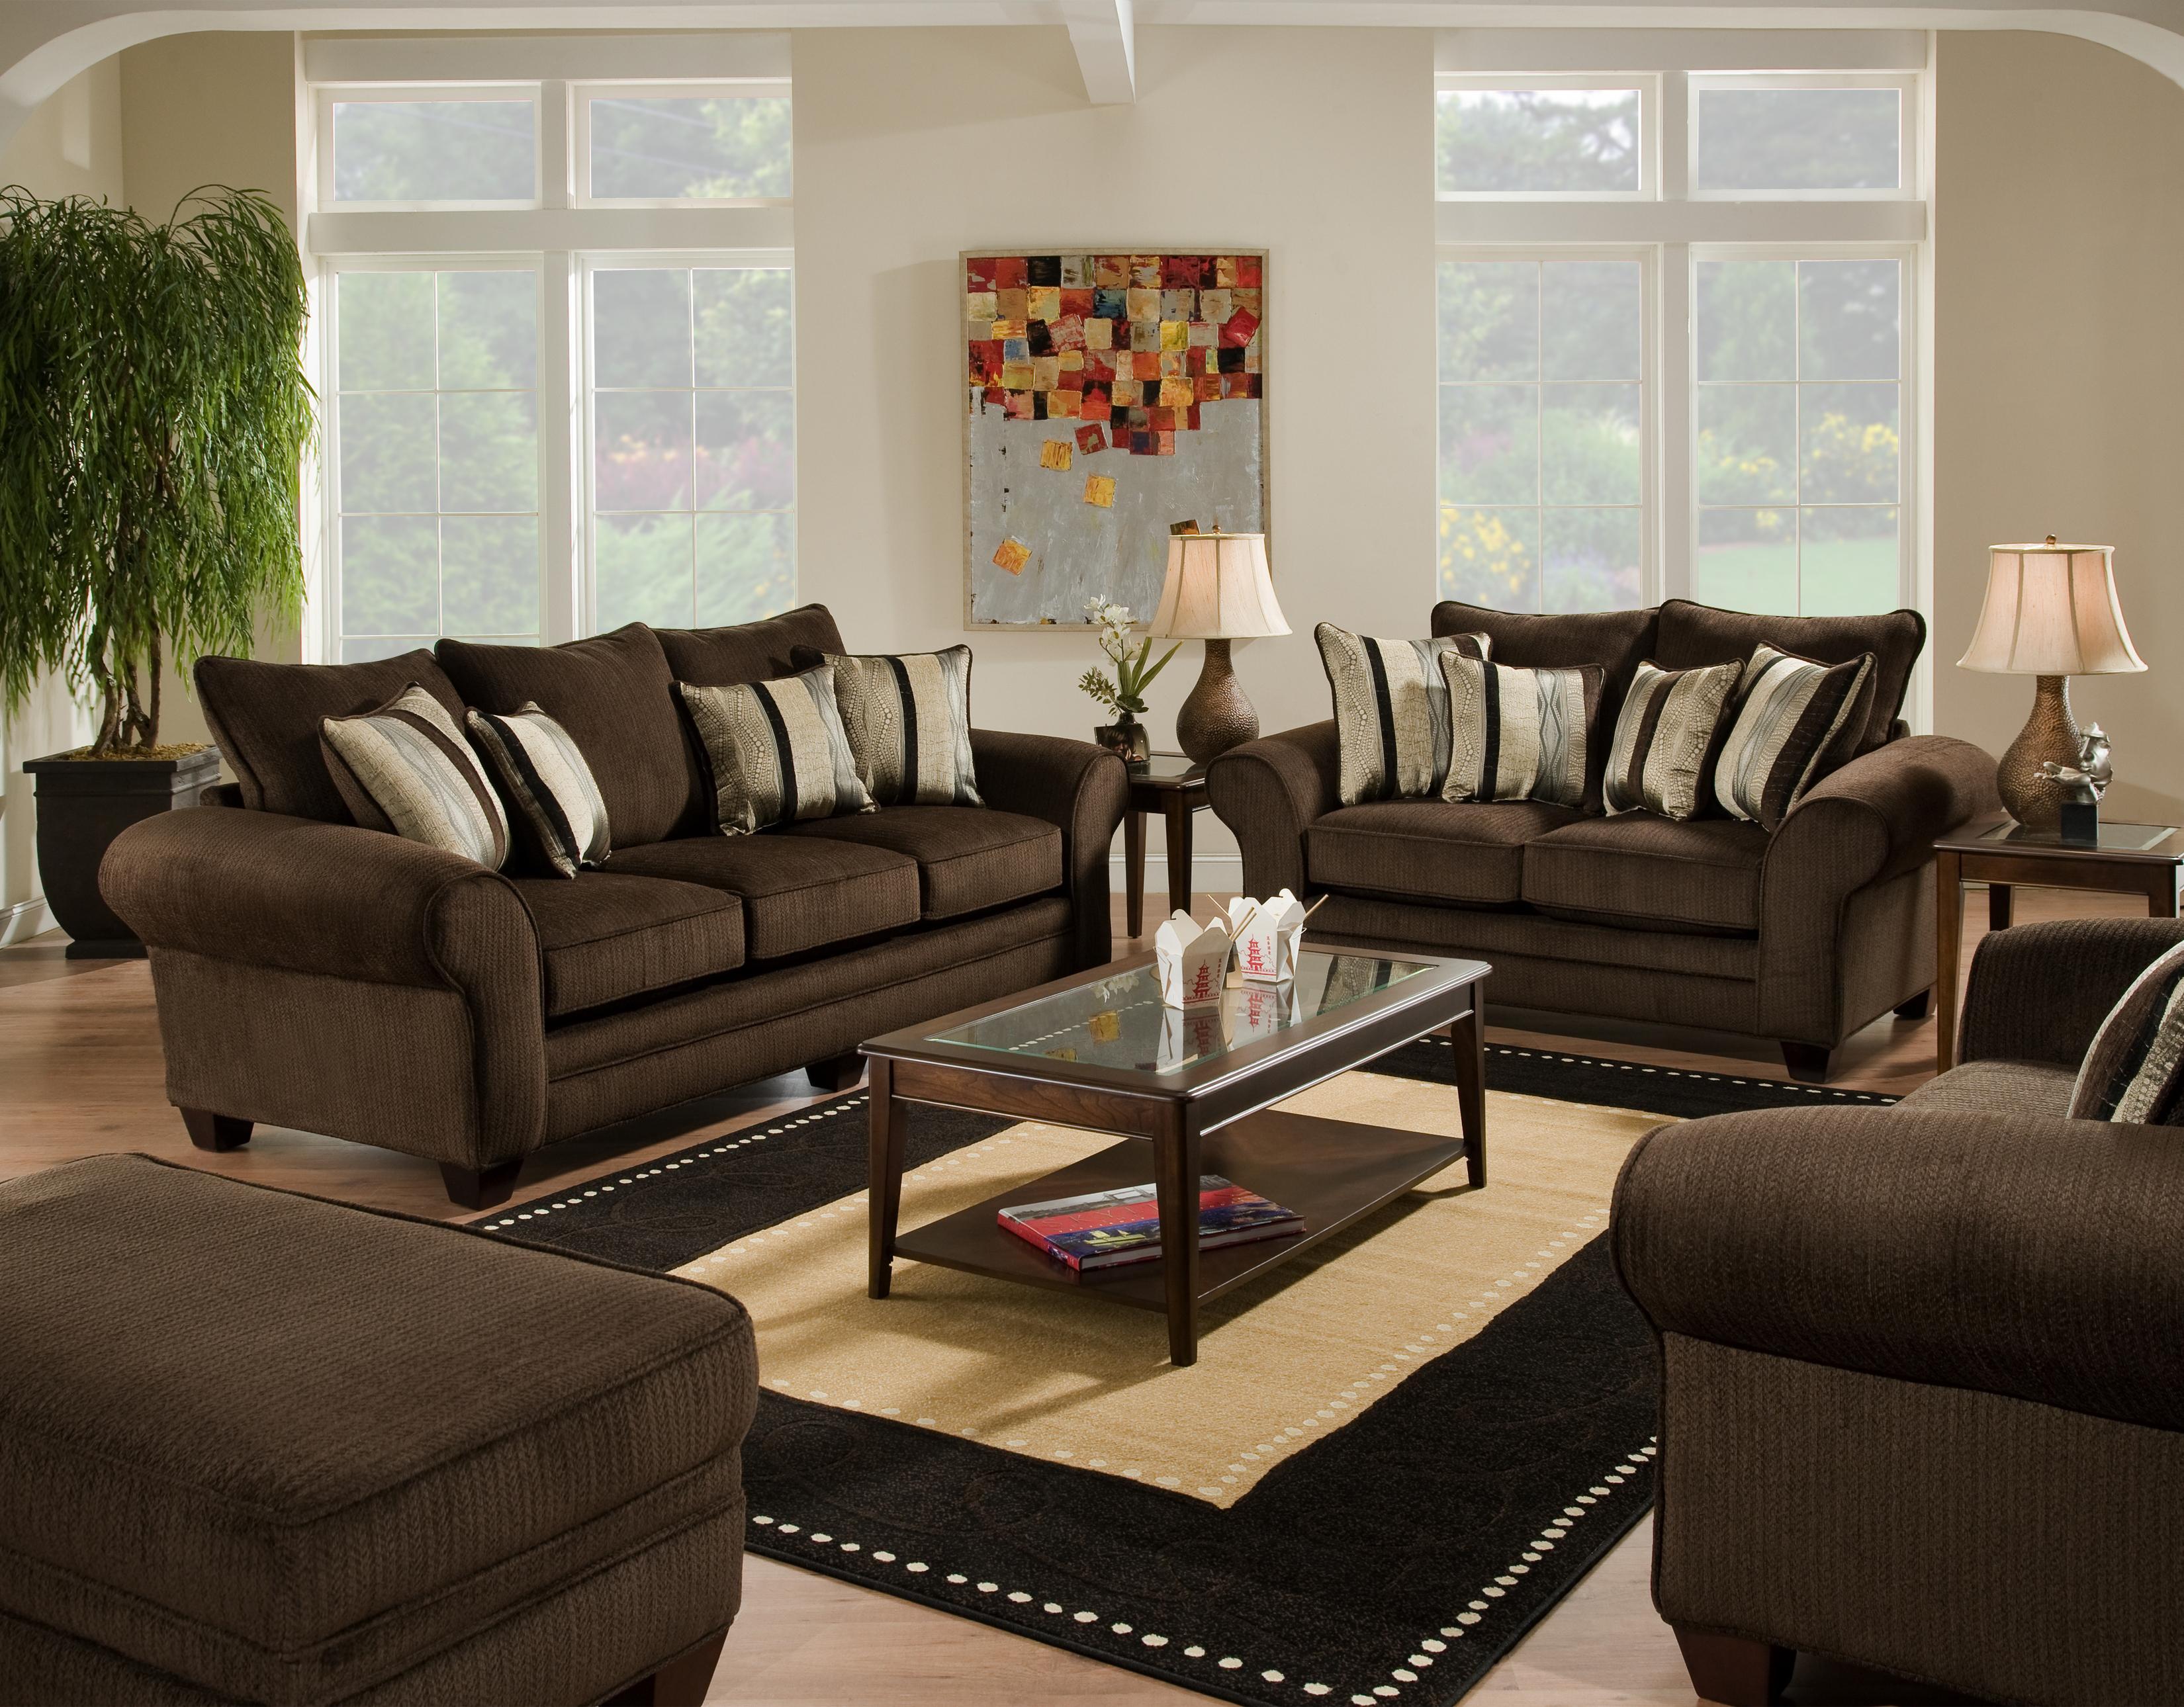 American furniture 3700 stationary living room group item number waverly godiva living room group